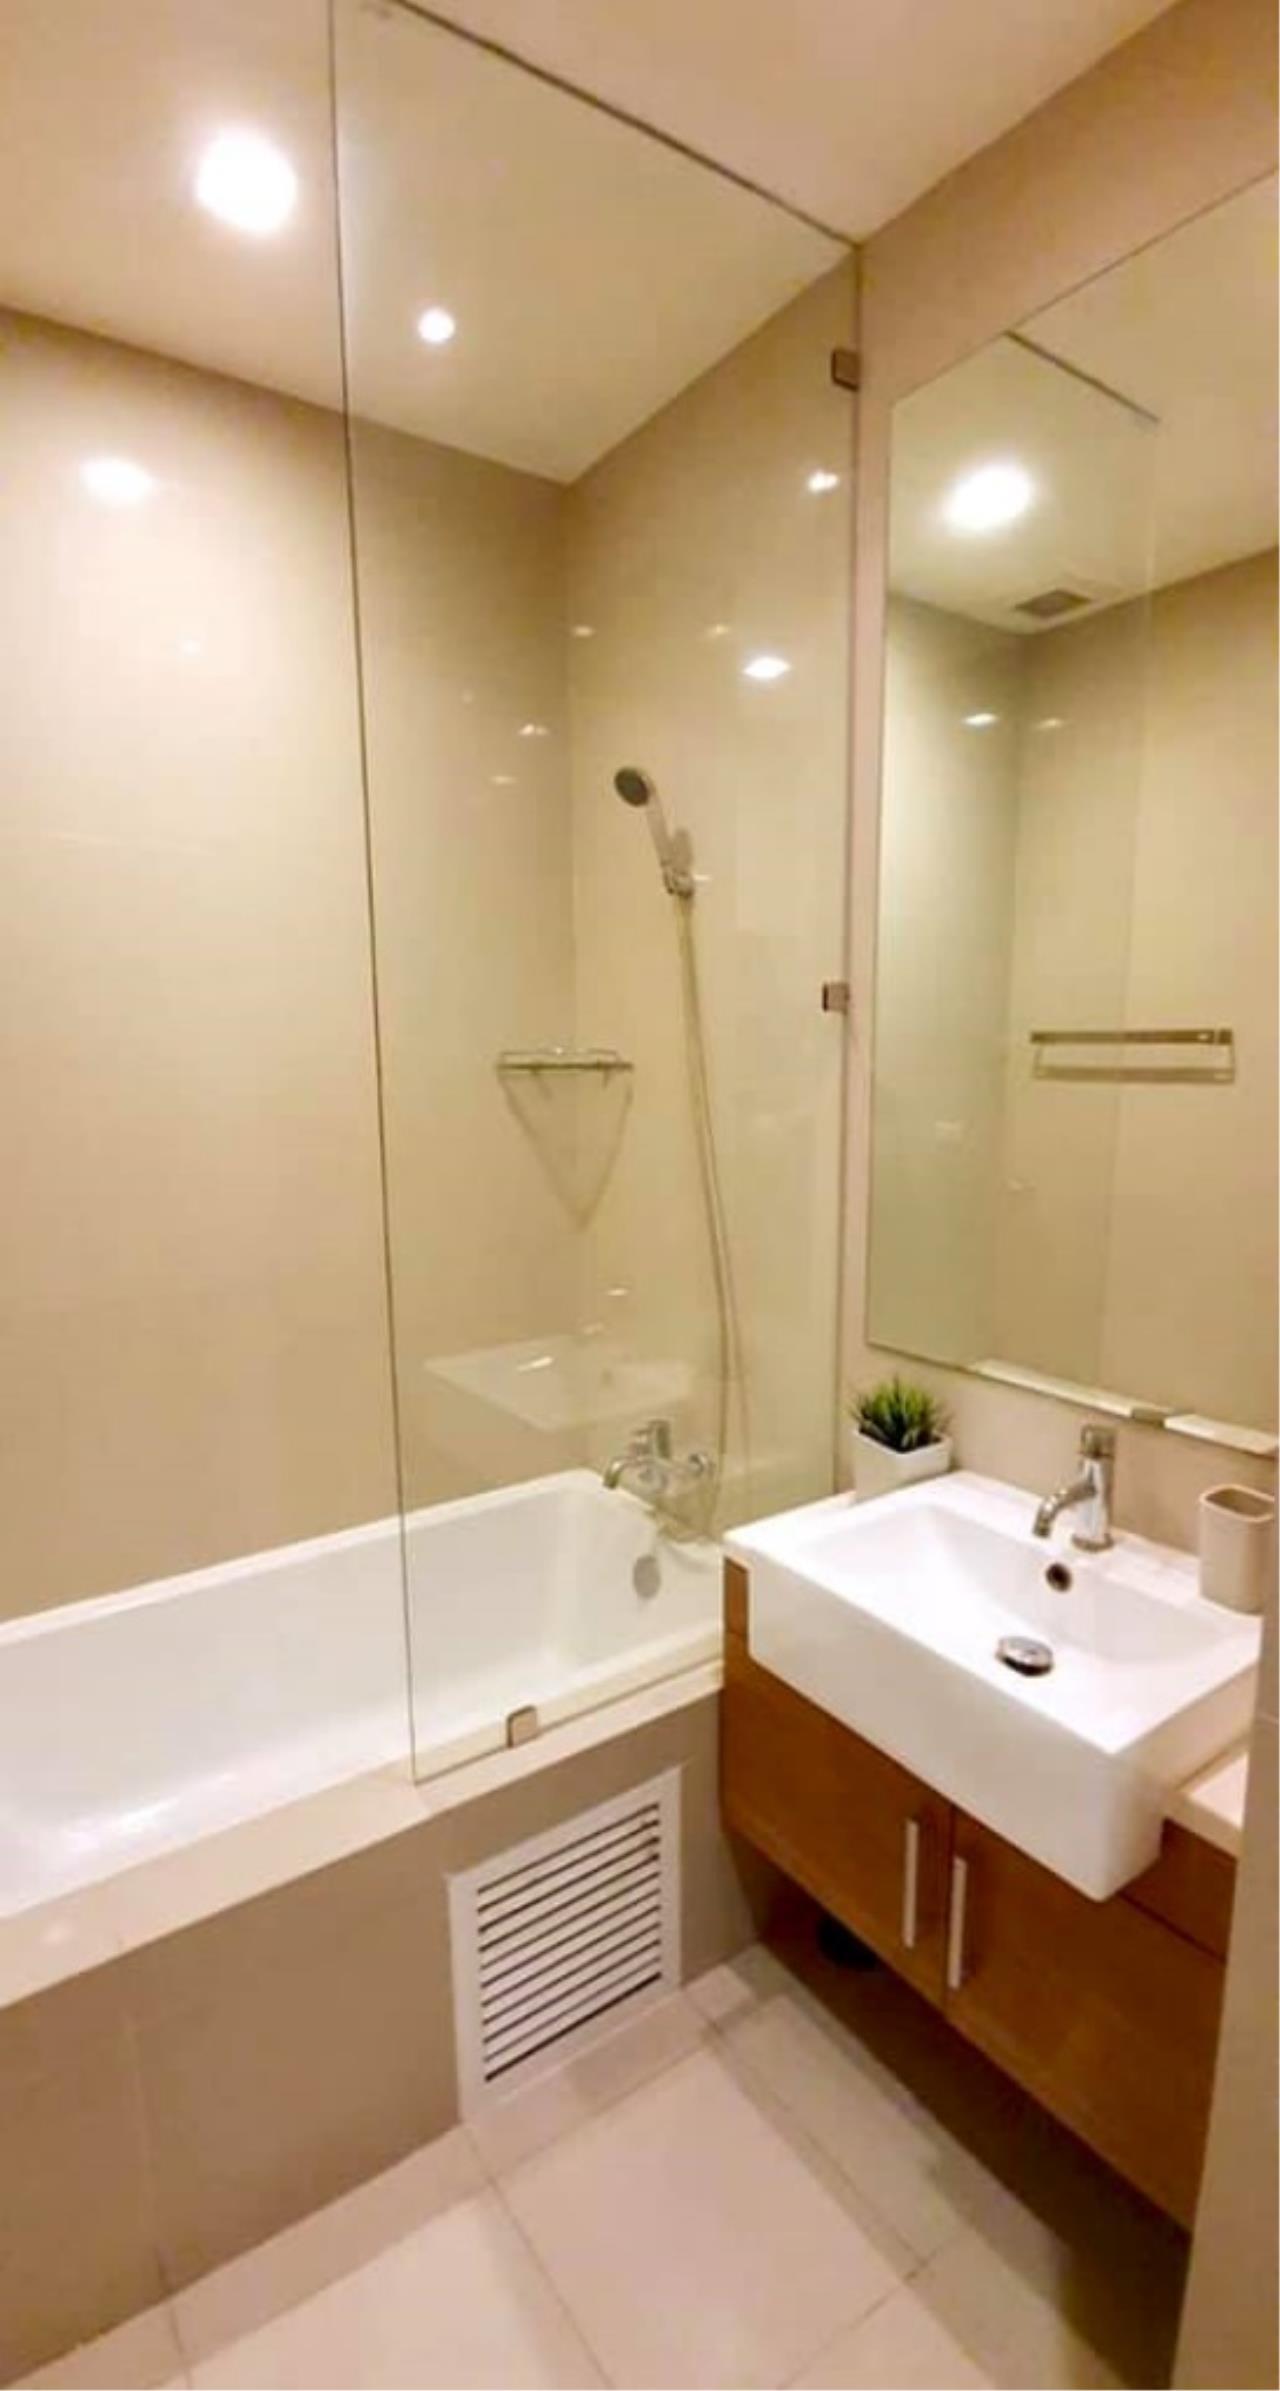 Century21 Skylux Agency's Noble Reveal / Condo For Sale / 1 Bedroom / 48 SQM / BTS Ekkamai / Bangkok 9